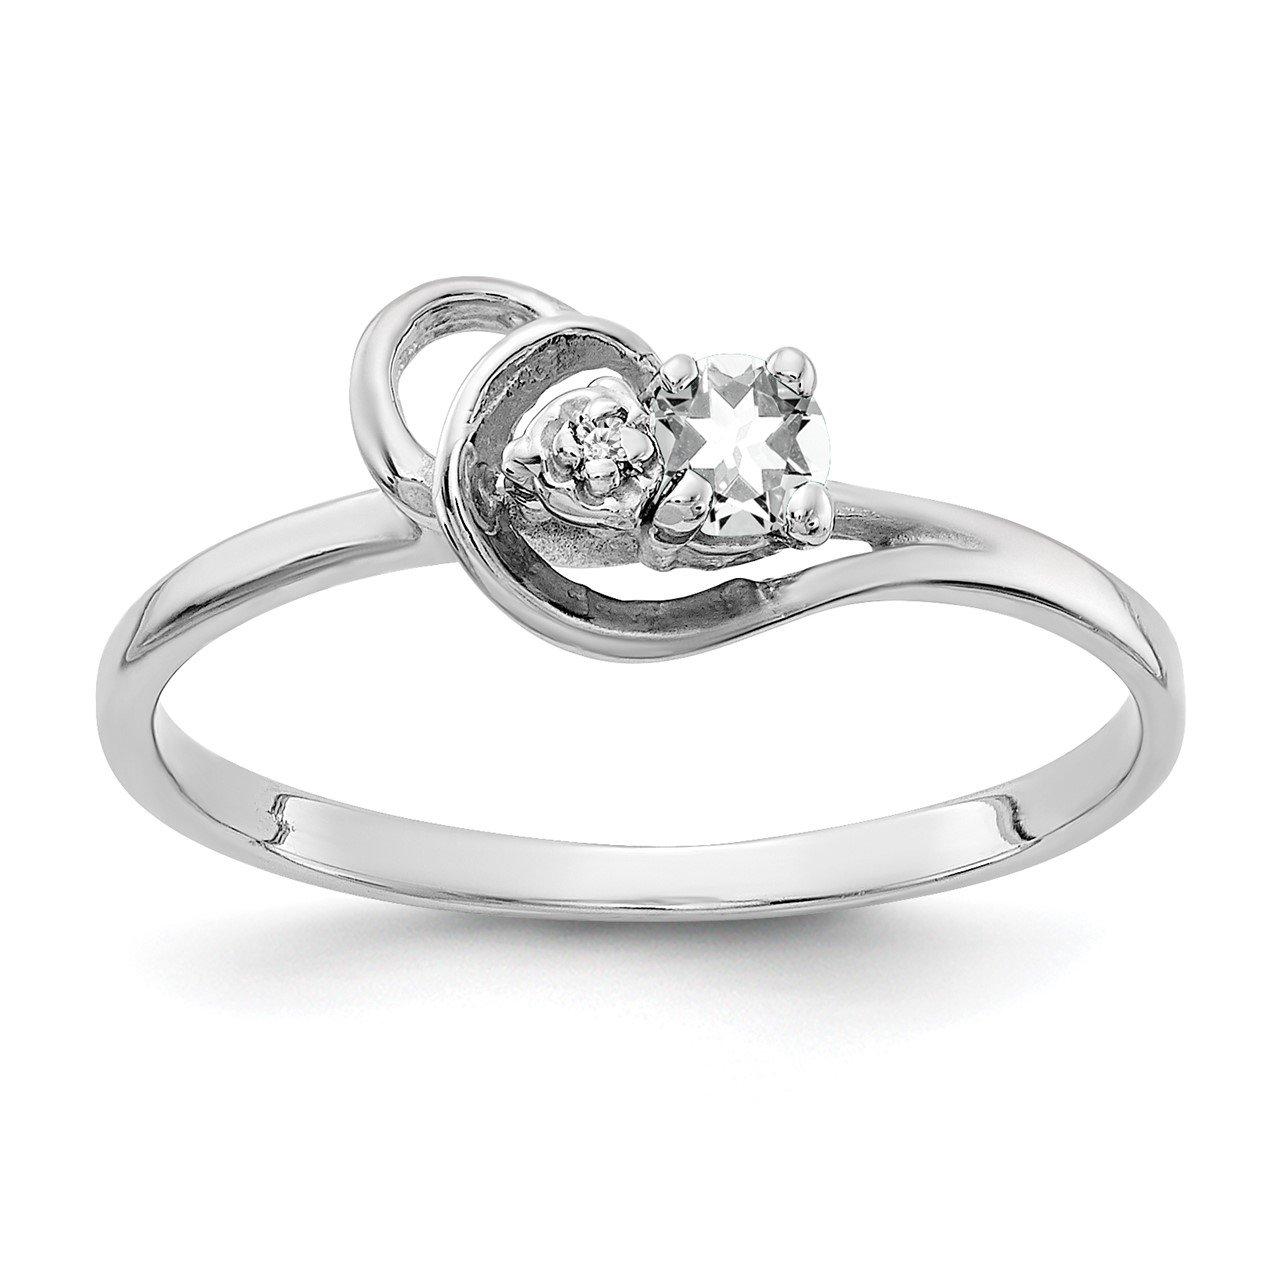 14k White Gold 3mm Cubic Zirconia VS Diamond ring